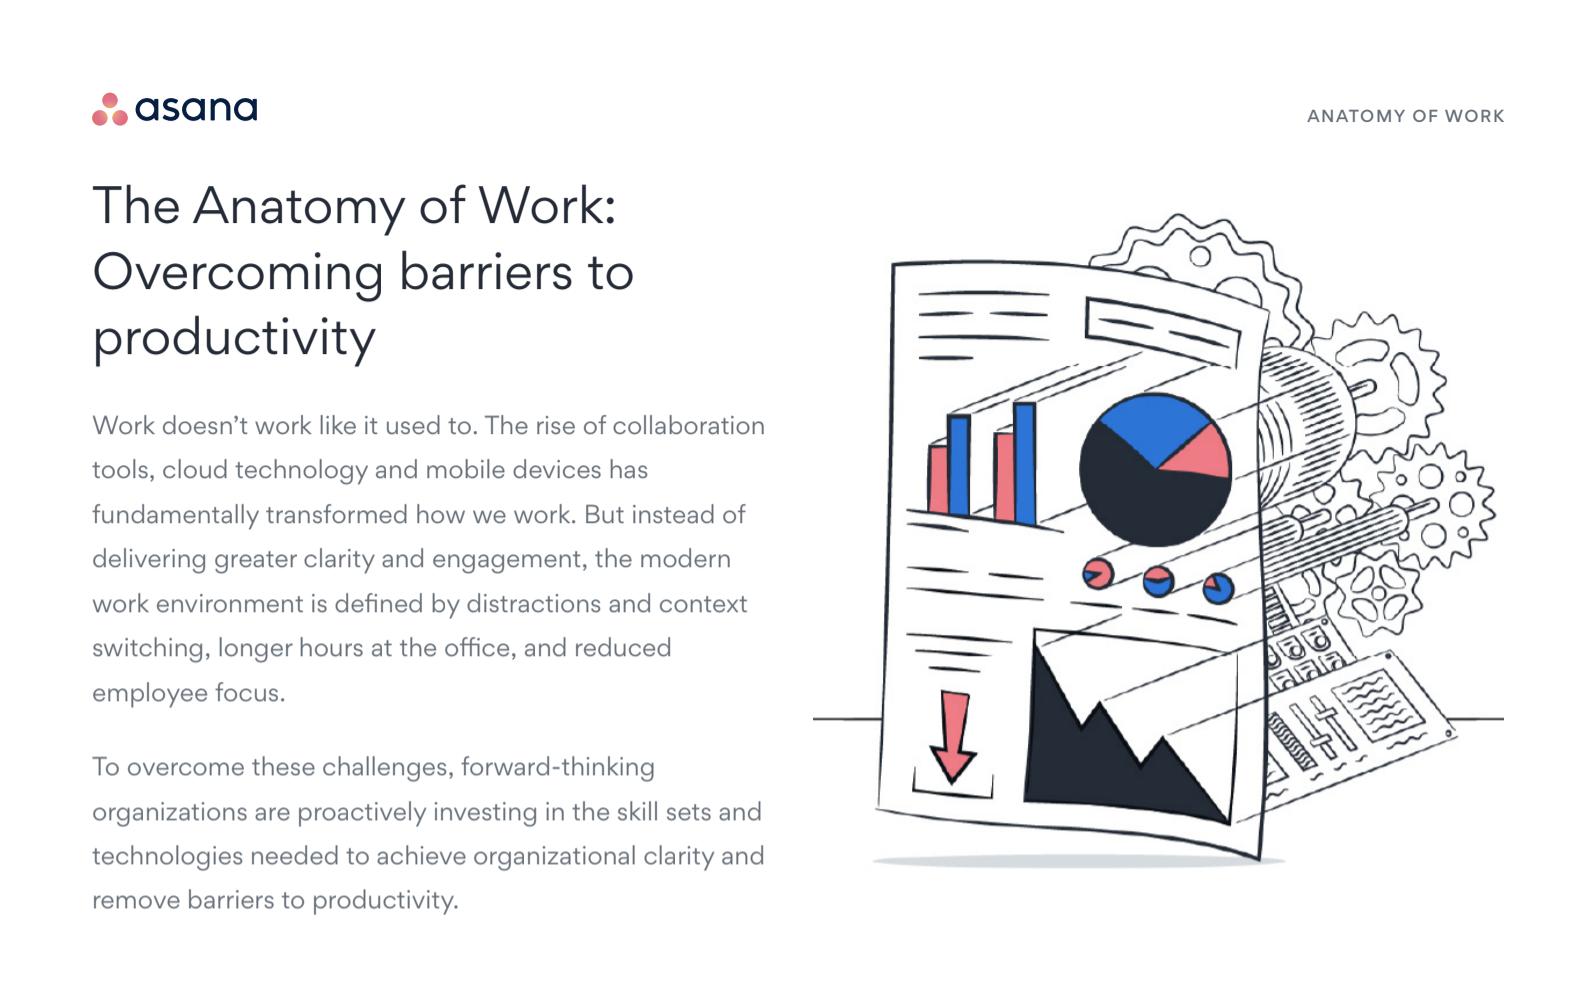 Asana - Anatomy of Work overcoming barriers to productivity